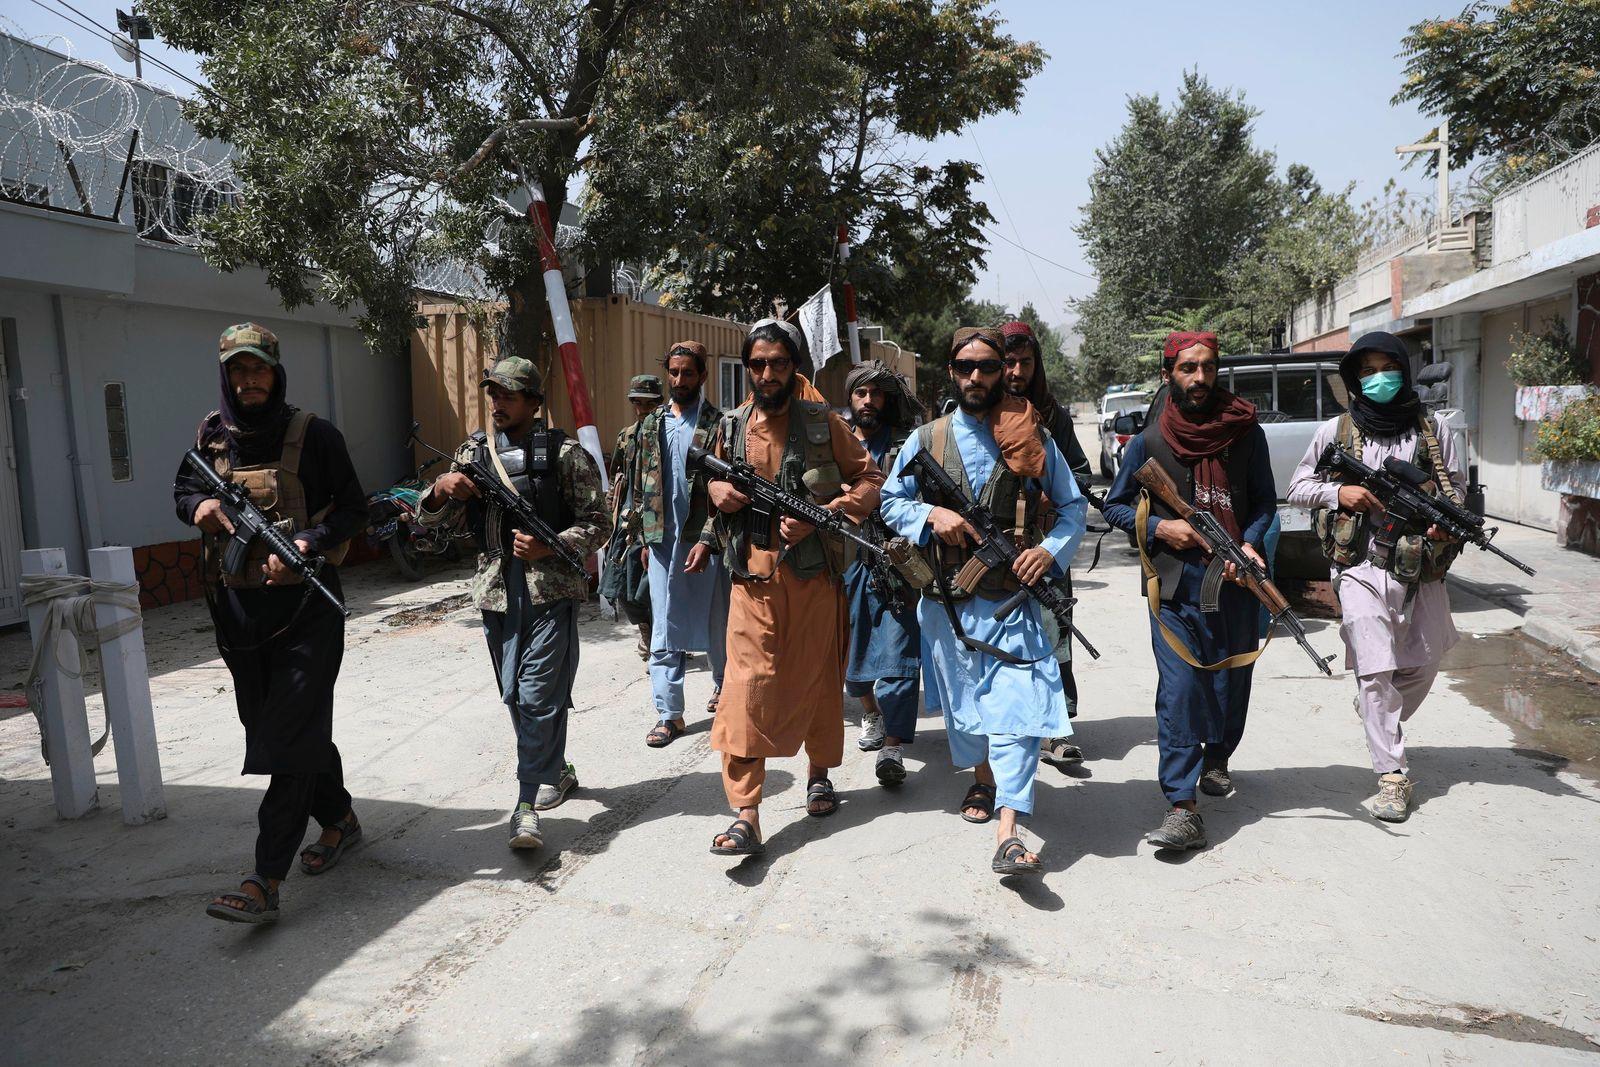 Russia Befriending Taliban